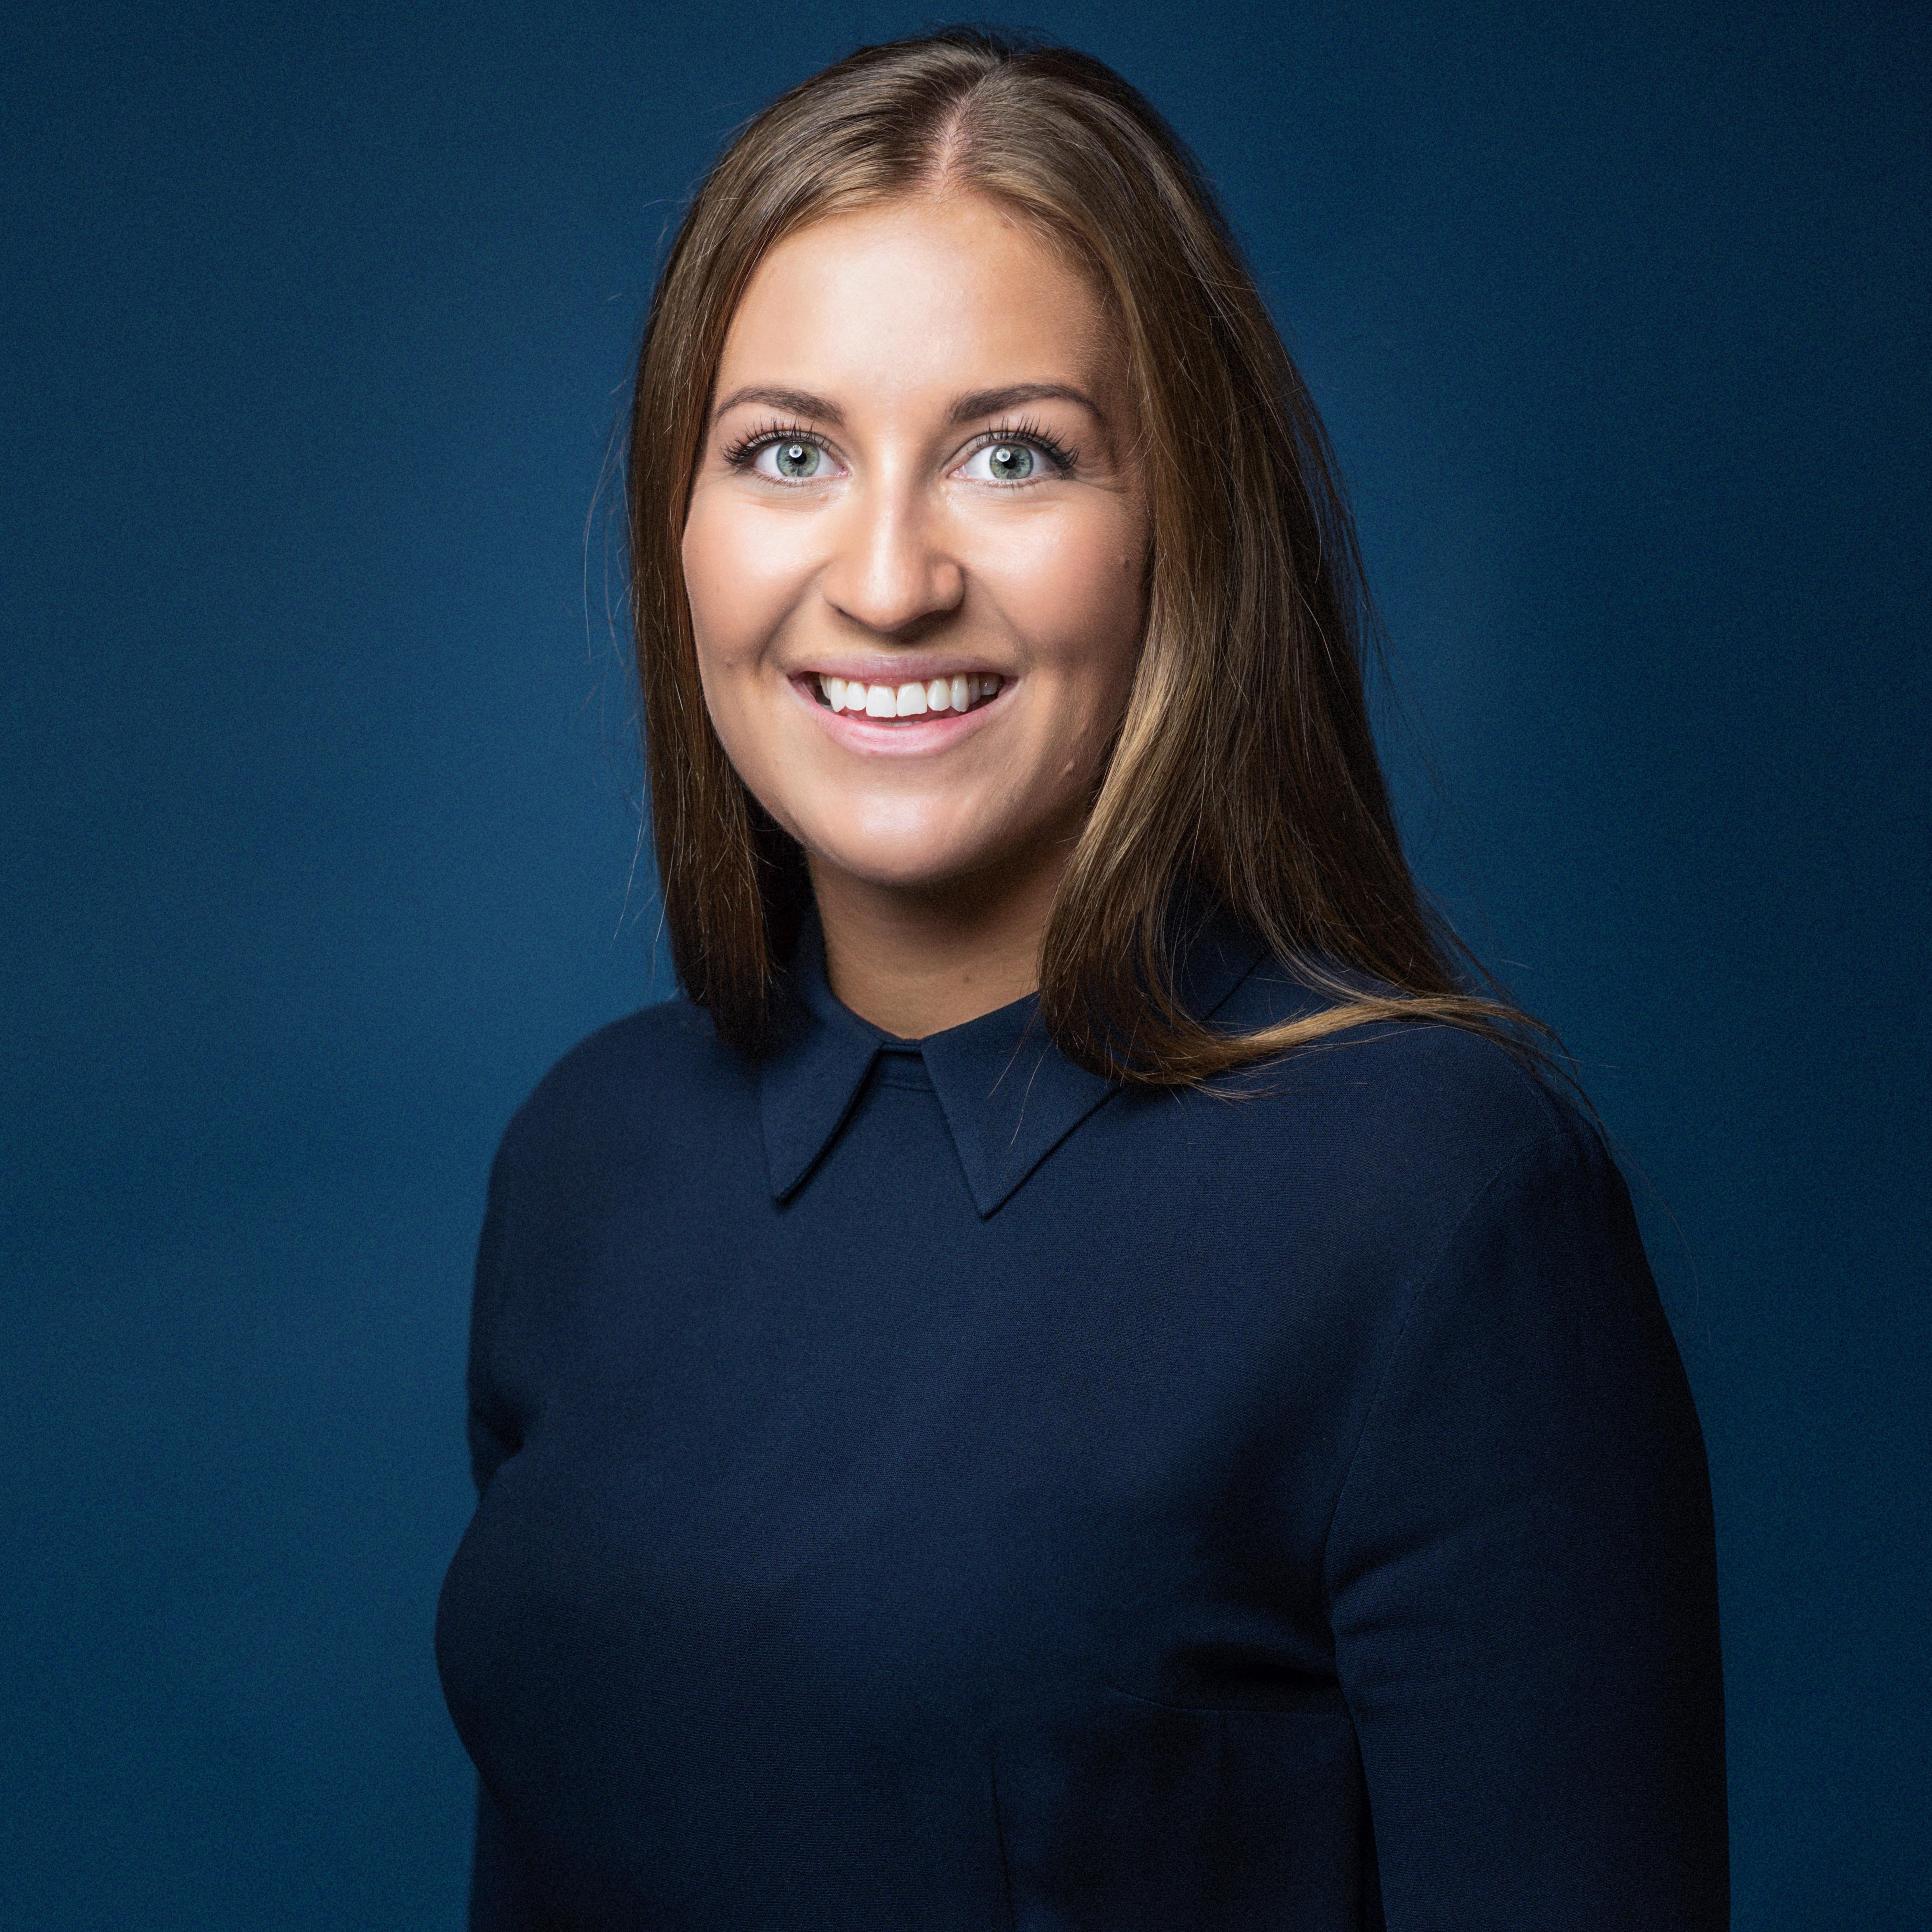 Hanna Sande Jacobsen